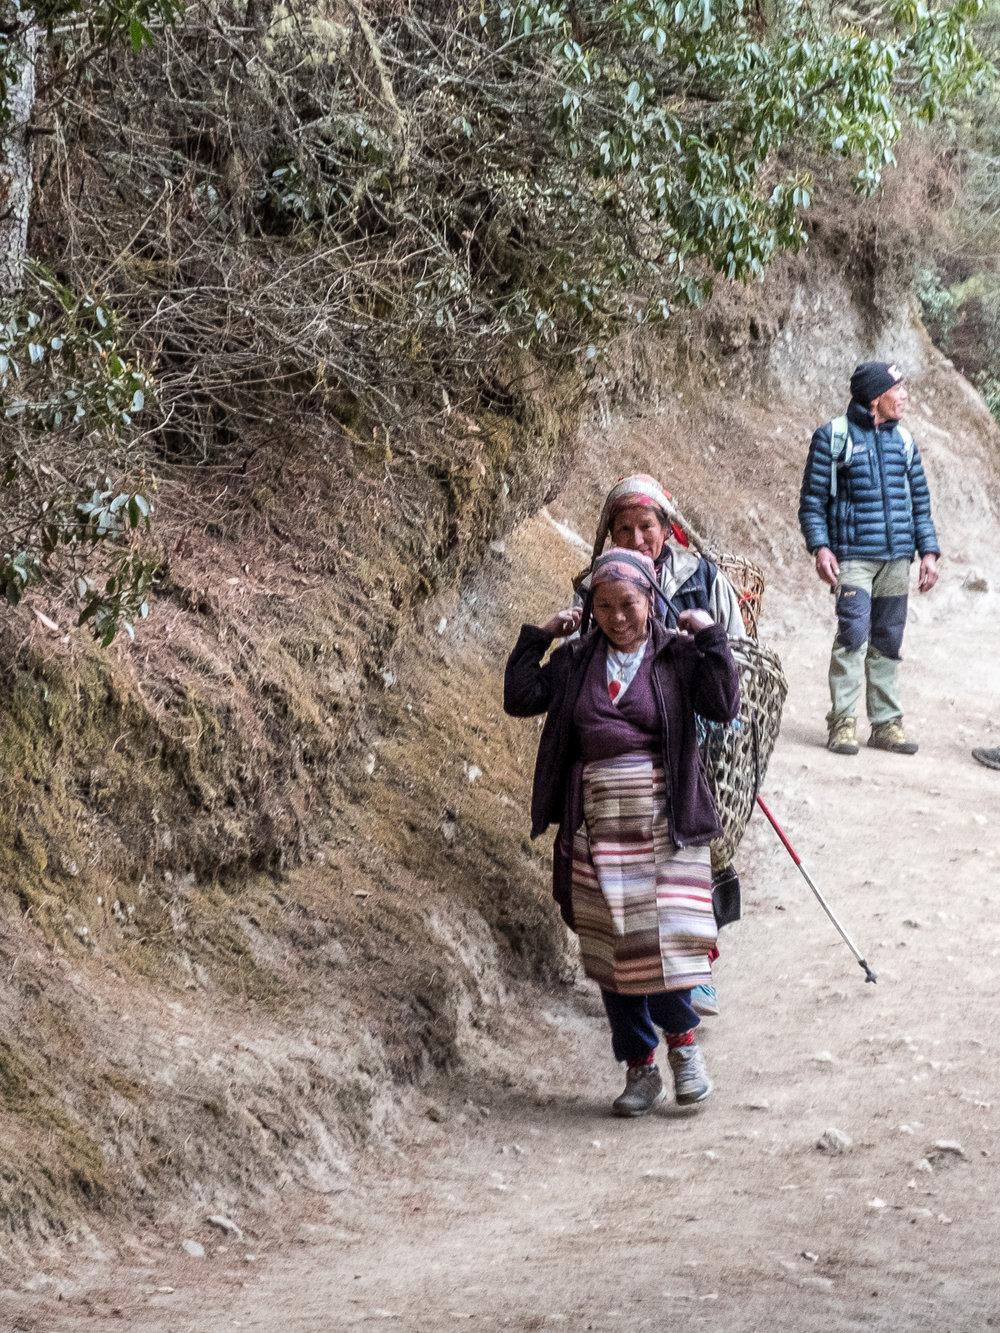 Women carrying goods, Khumbu region, Nepal.